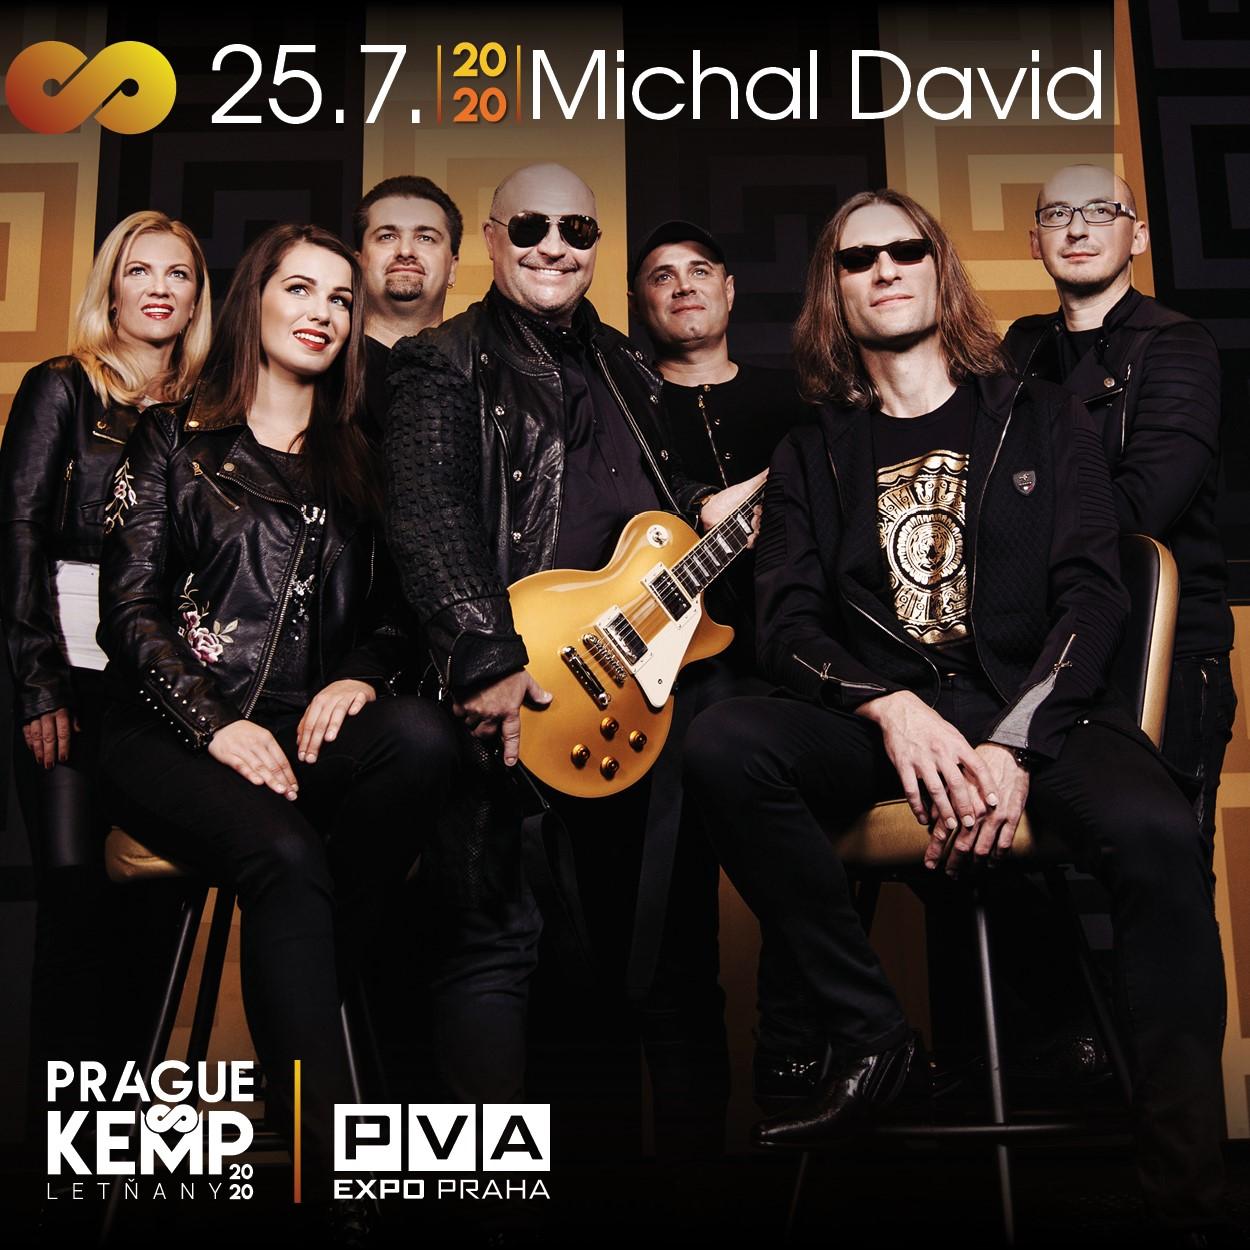 MICHAL DAVID